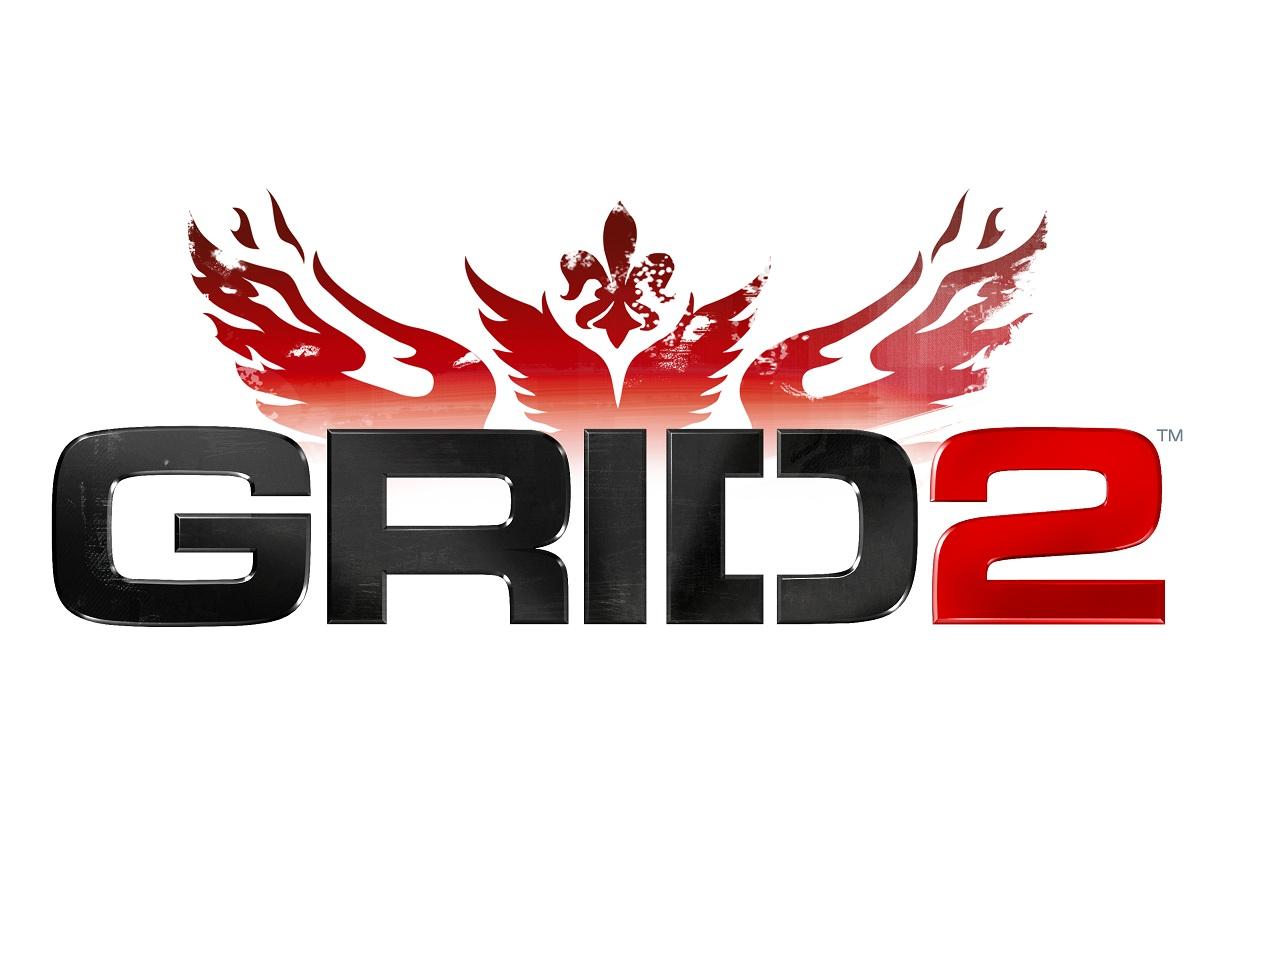 Grid 2 Game Wallpaper High Resolution Pics: Grid-2-wallpaper « GamingBolt.com: Video Game News